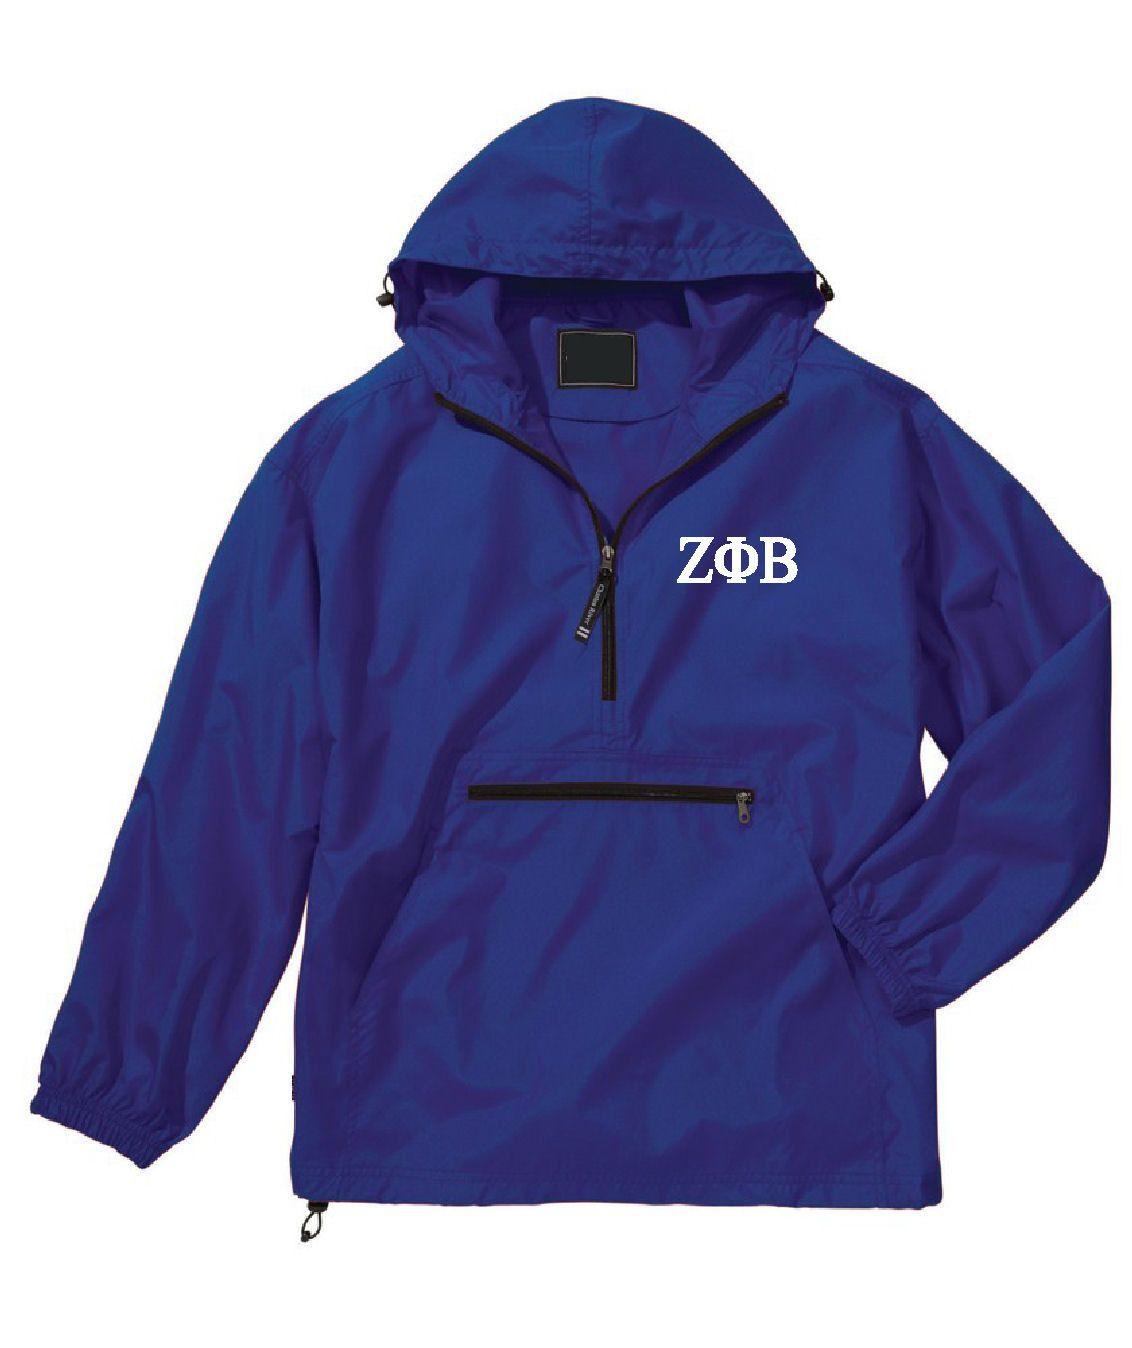 Pi Beta Phi Windbreaker Jacket Pi Beta Phi Lightweight Windbreaker Pi Phi Windbreaker Jacket Pi Beta Phi Hoodie Pi Phi Jacket